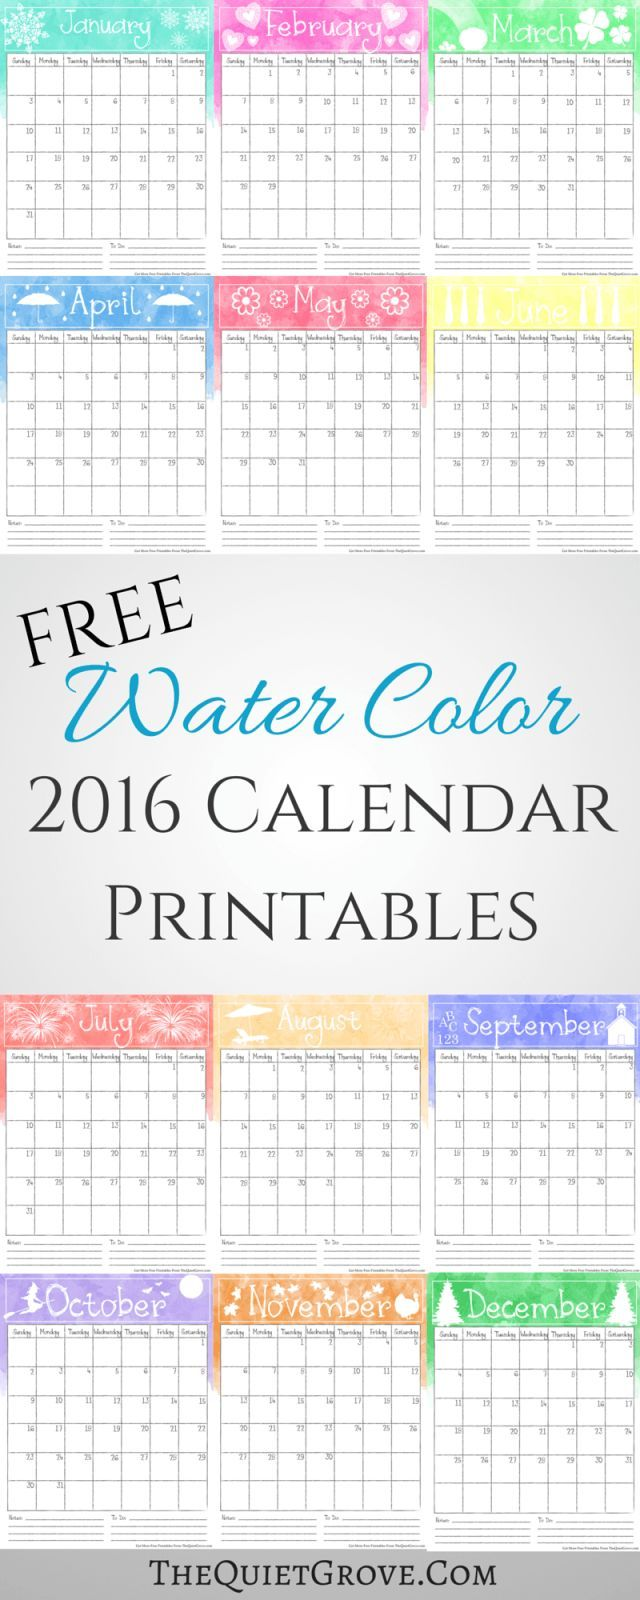 640x1600 Free Watercolor 2016 Printable Calendar Free Printable Calendars